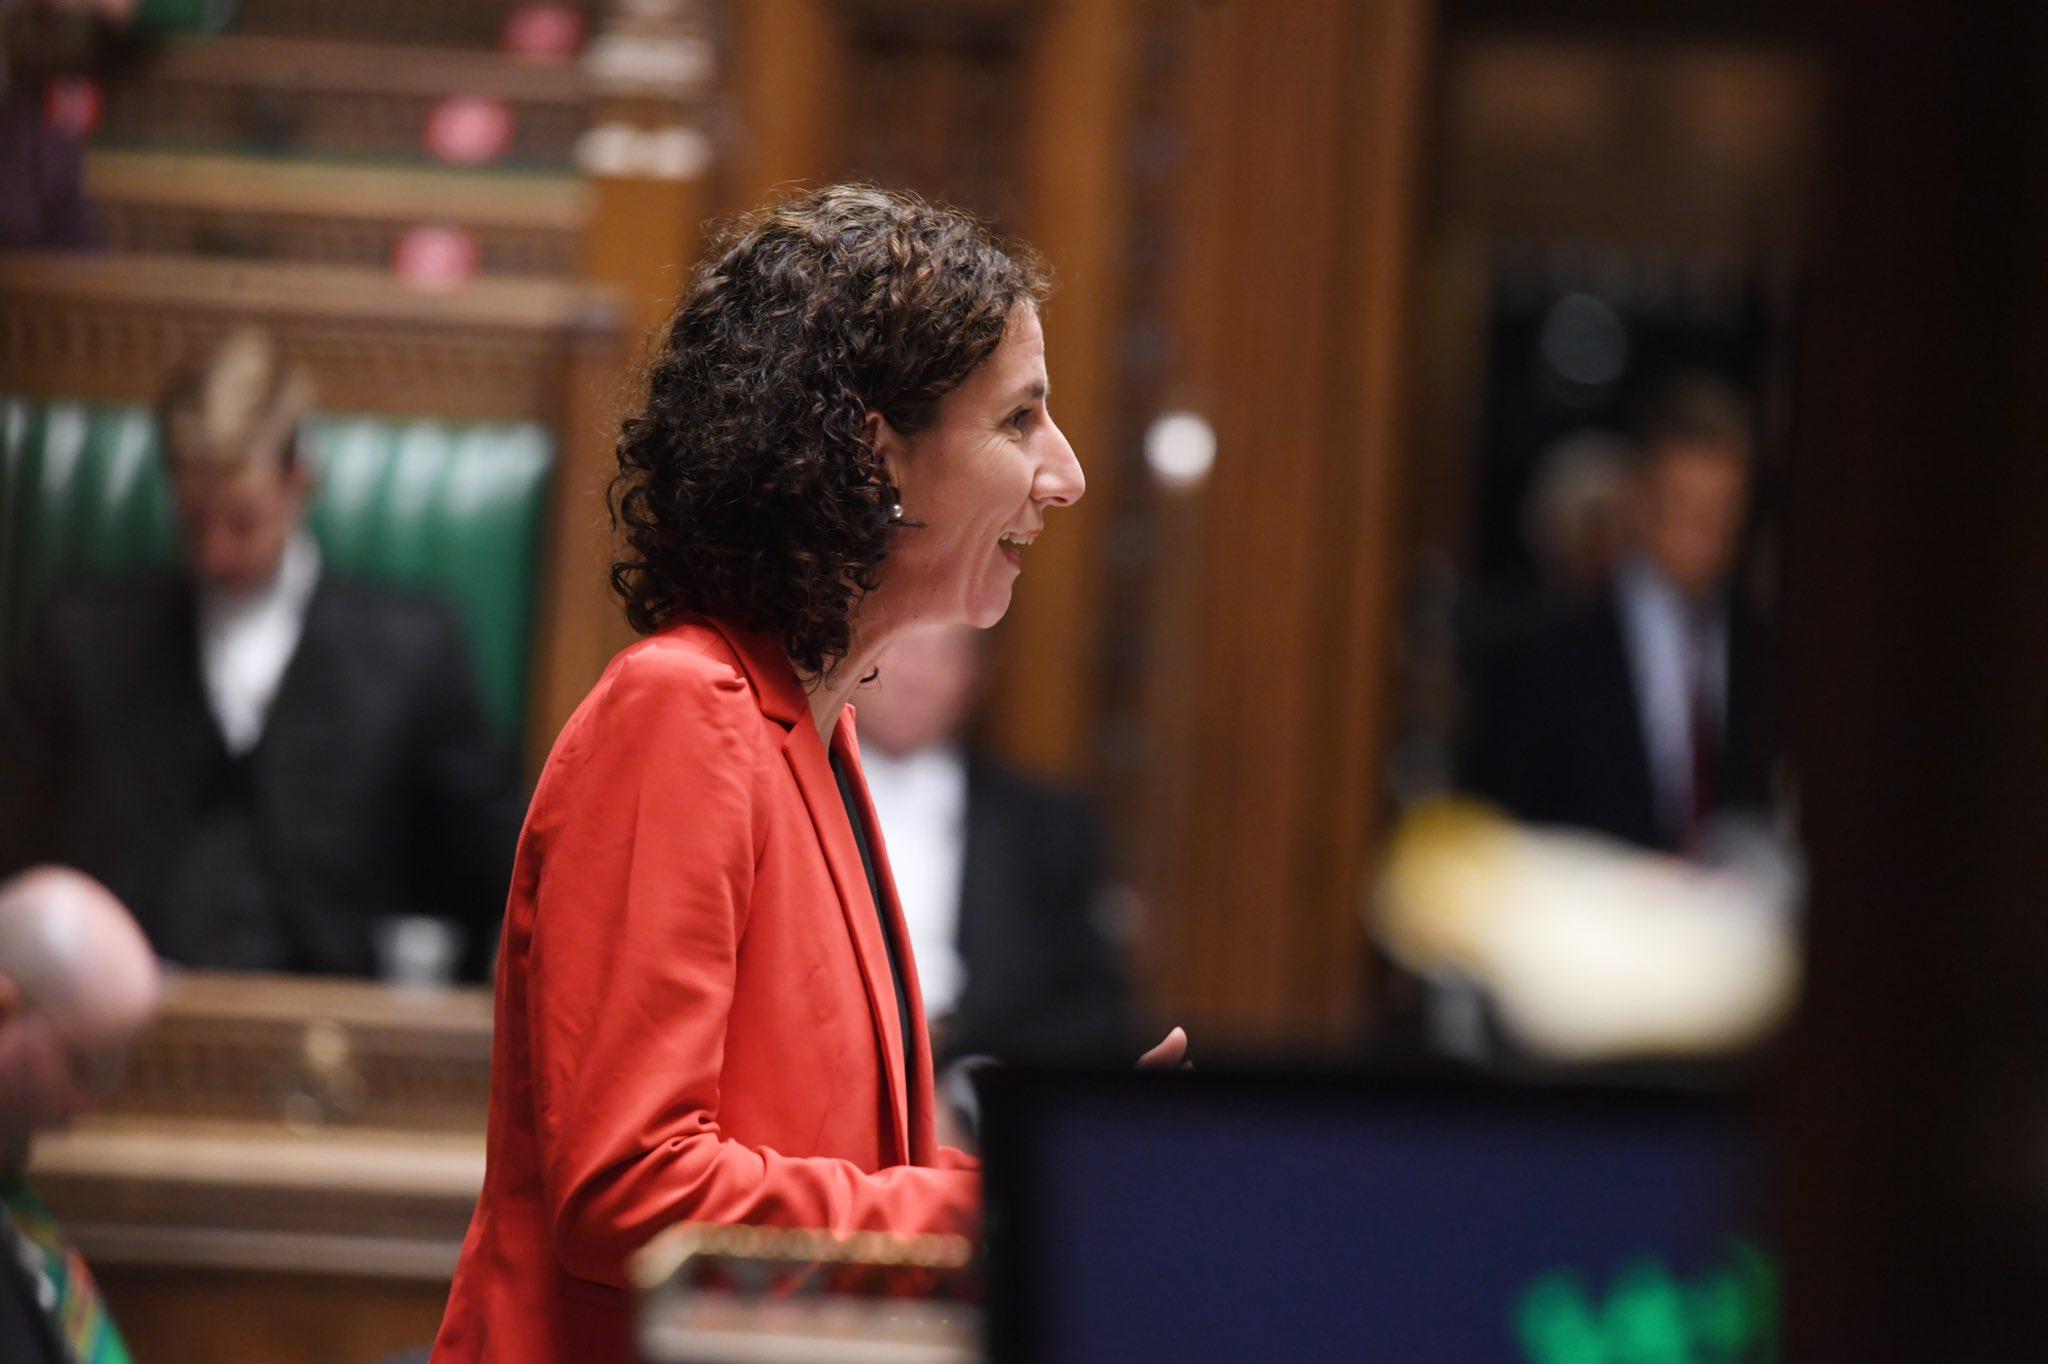 labourlist.org - Elliot Chappell - Dodds: Labour seeking 'genuine partnership' with financial services